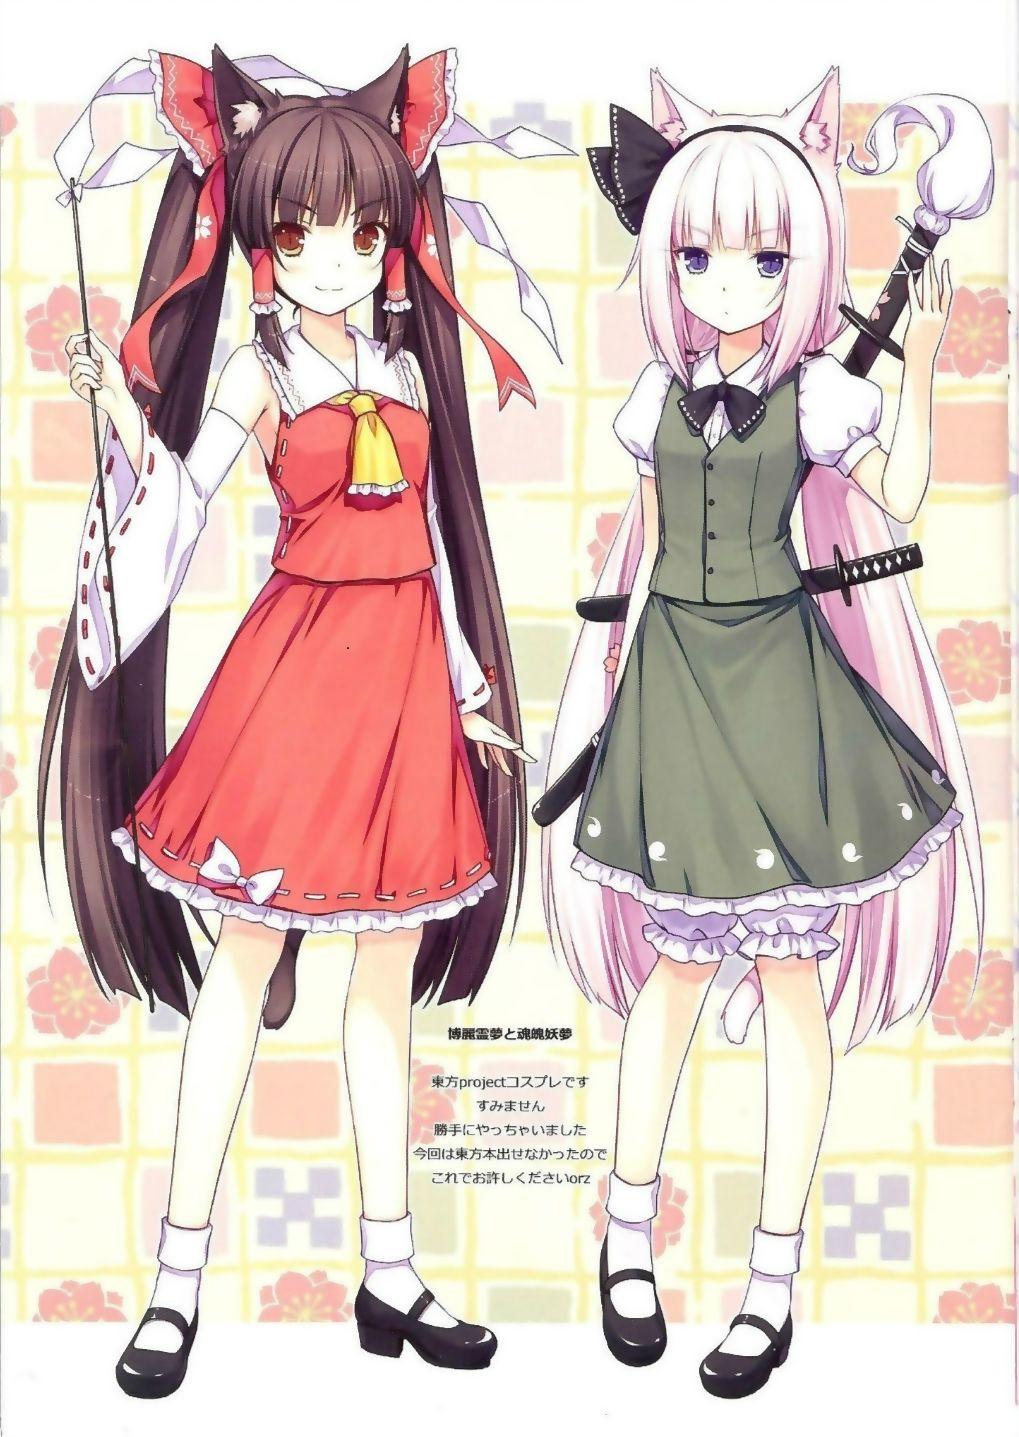 neko work - Tìm với Google | chocolat | Pinterest | Google, Anime ...